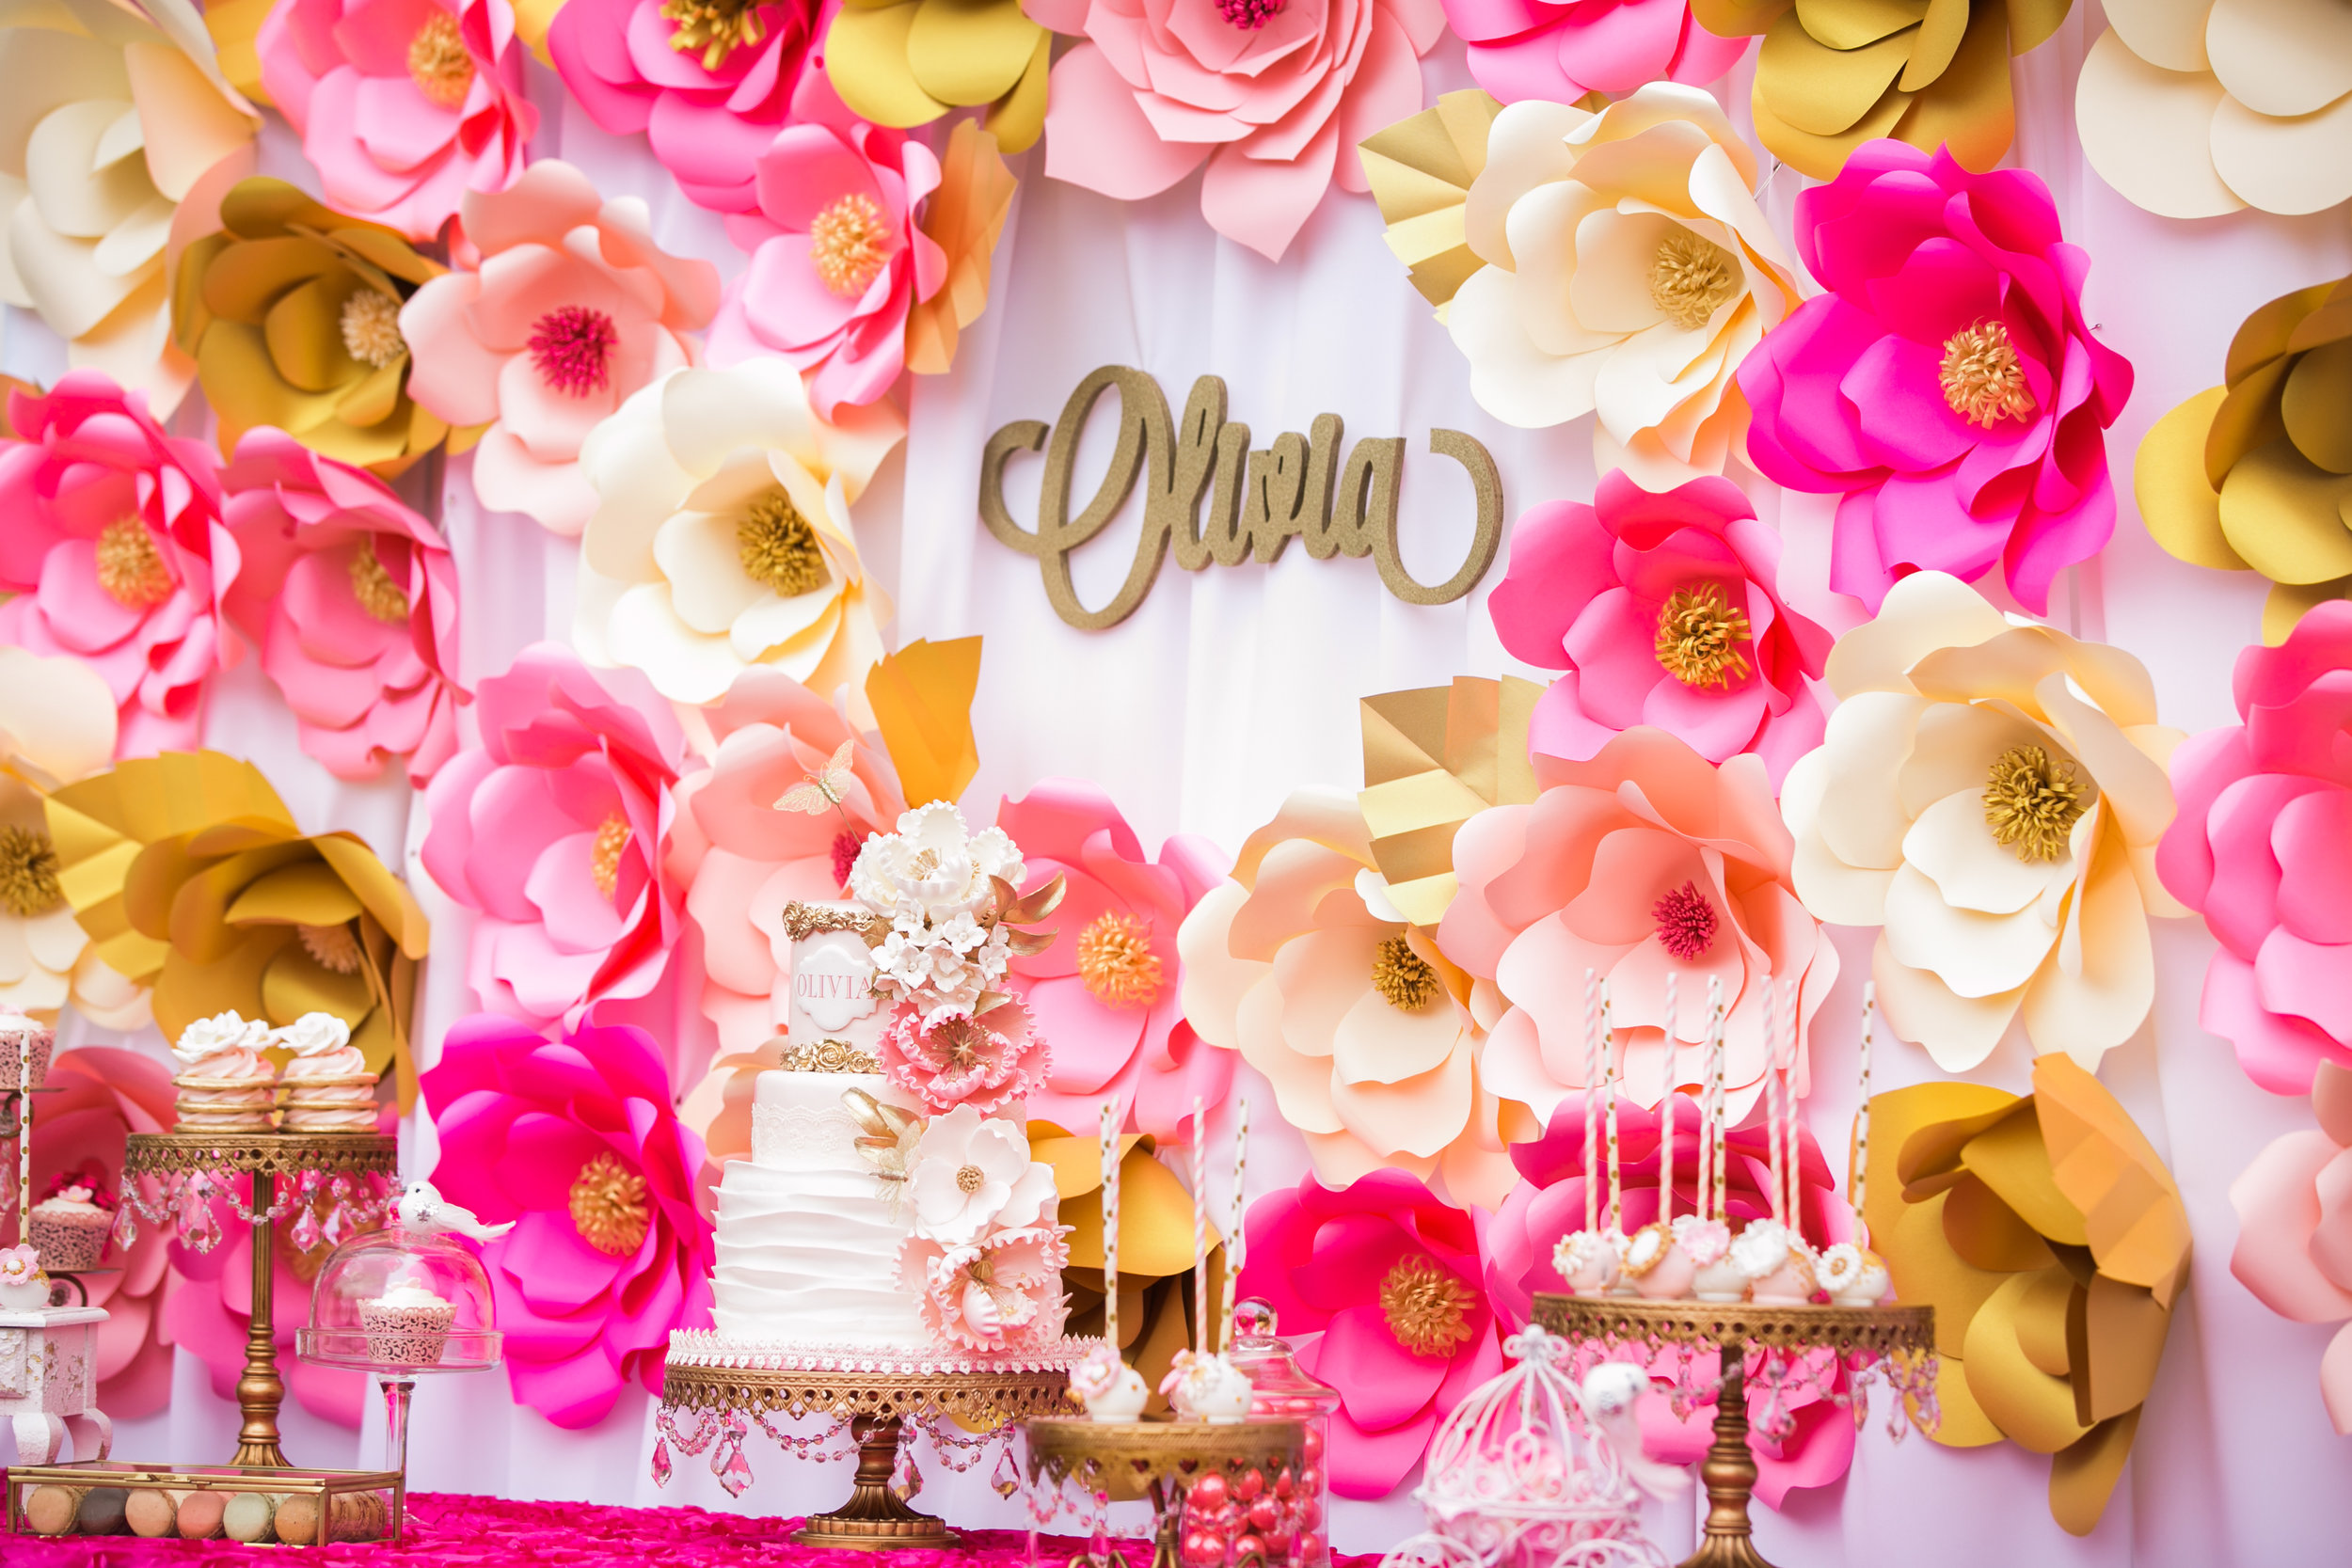 gold-chandelier-cake-stand-Birthday-paperflowers.jpg